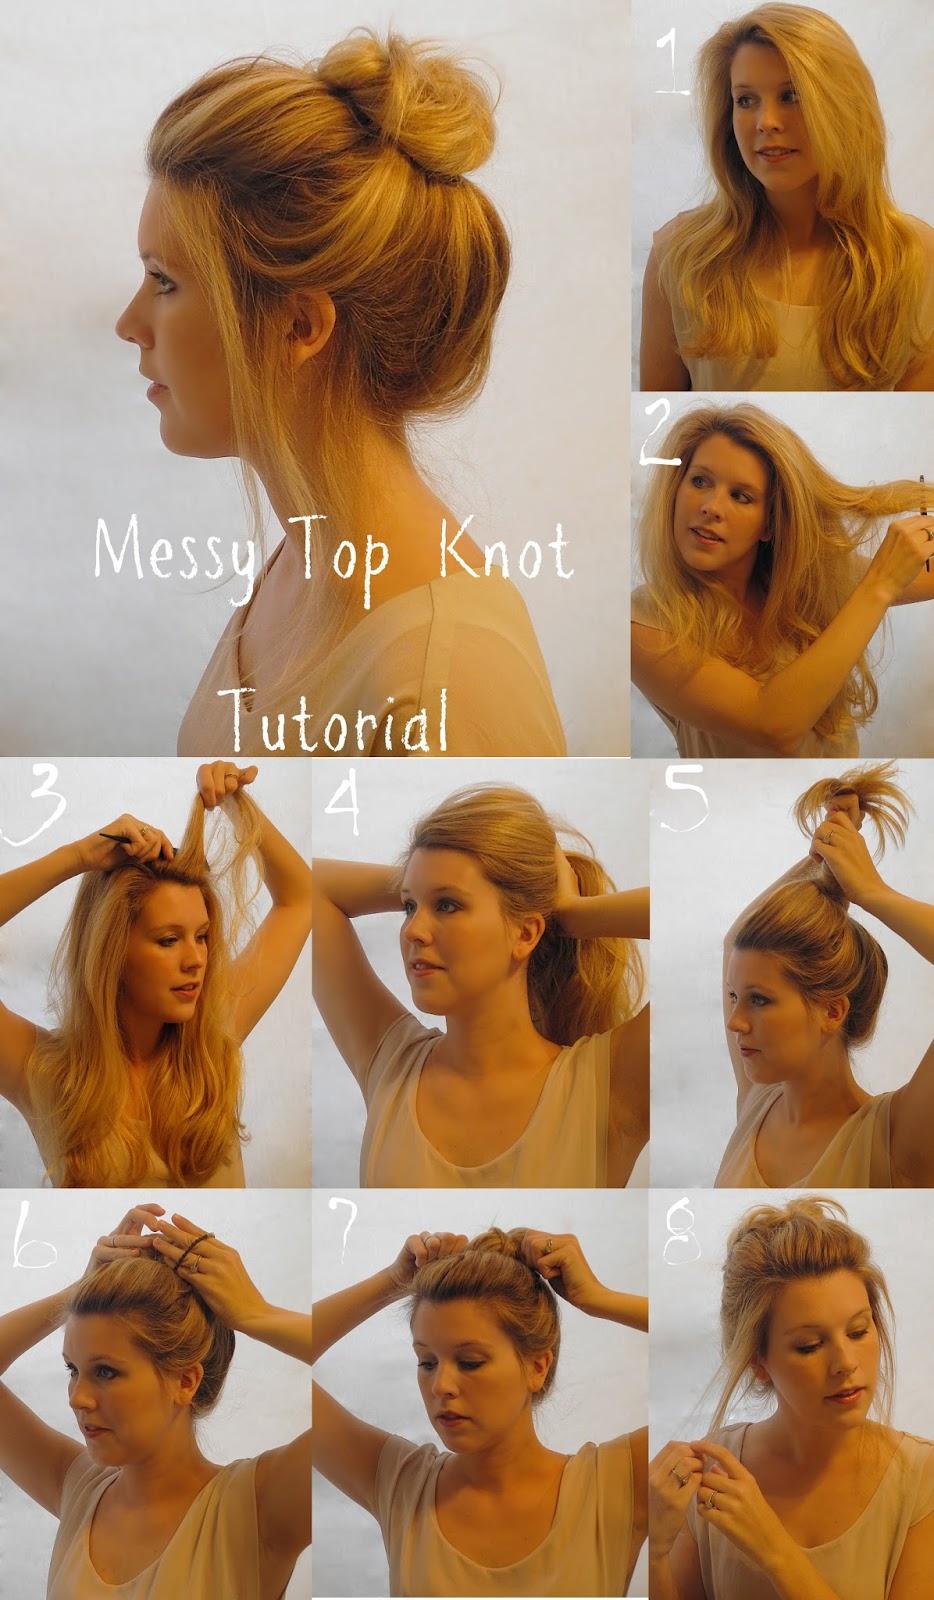 Surprising Top 25 Messy Hair Bun Tutorials Perfect For Those Lazy Mornings Short Hairstyles For Black Women Fulllsitofus